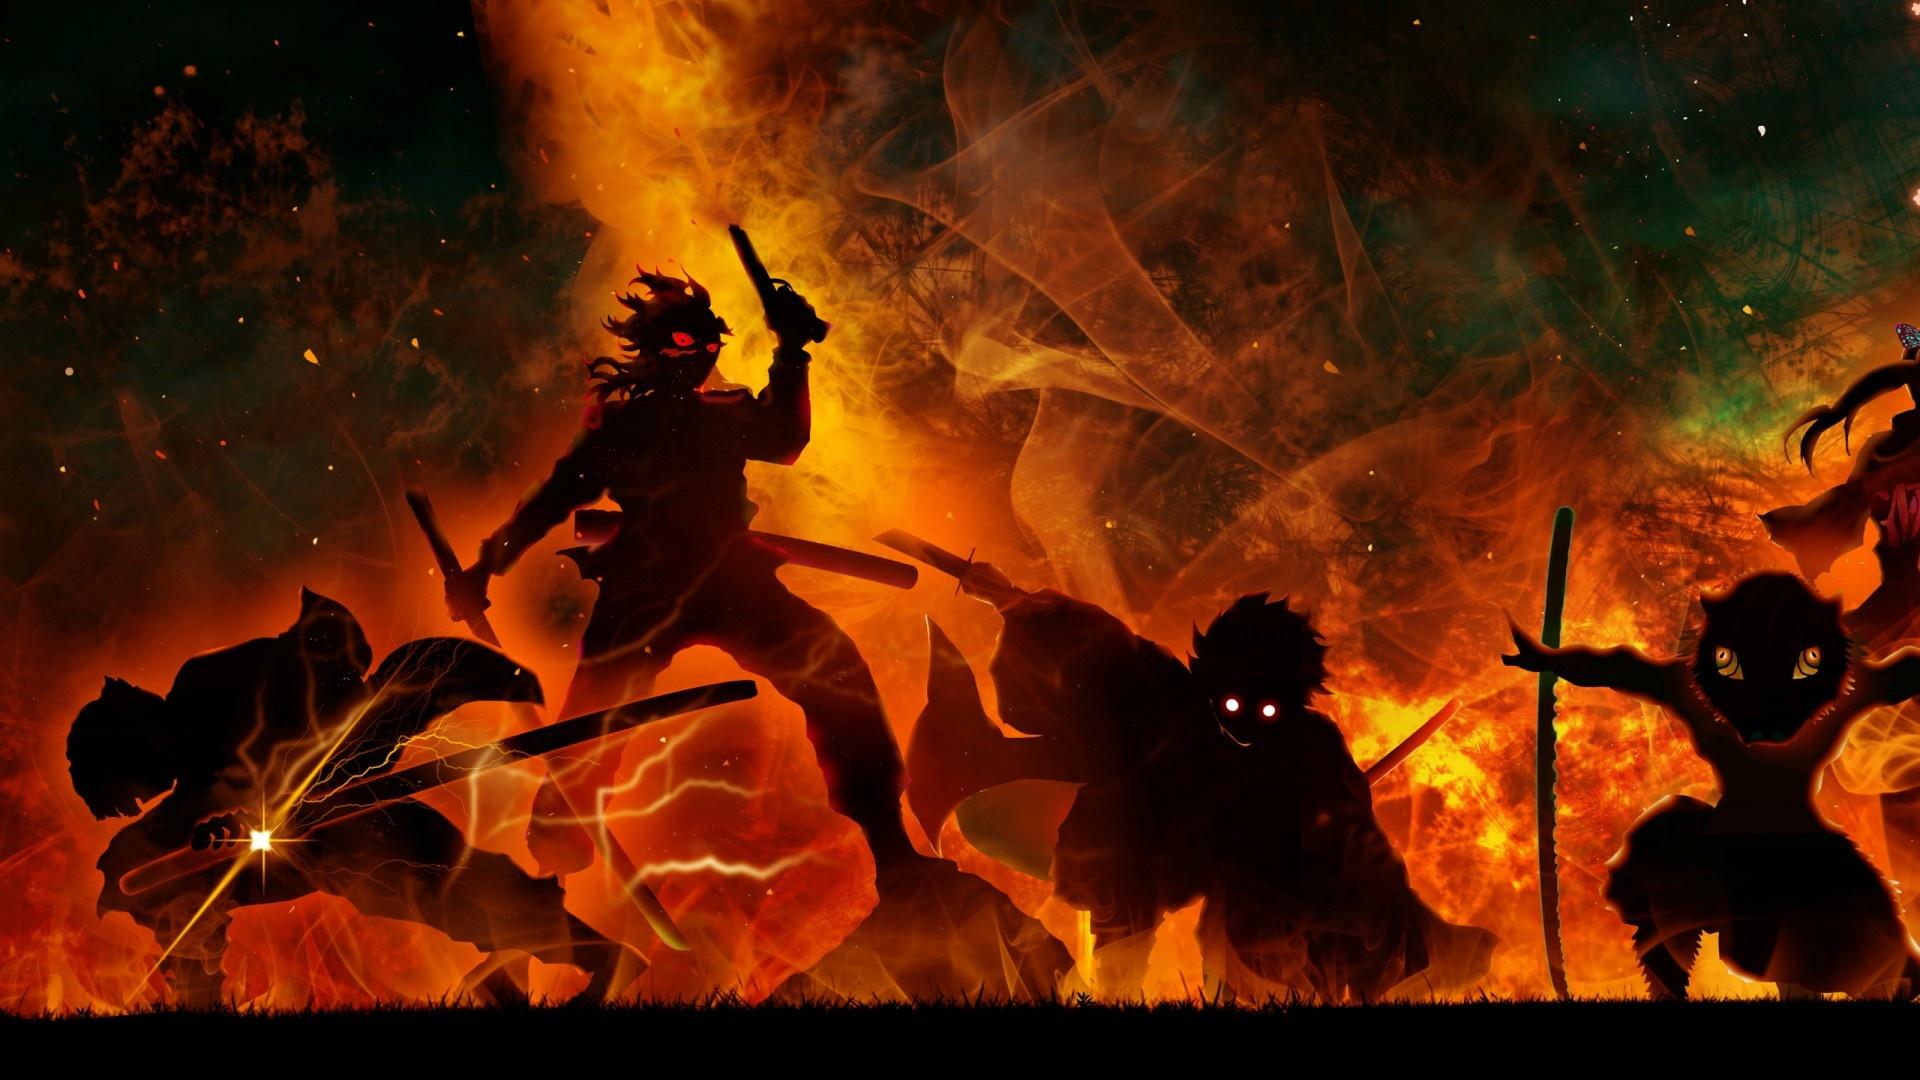 Demon Slayer desktop background